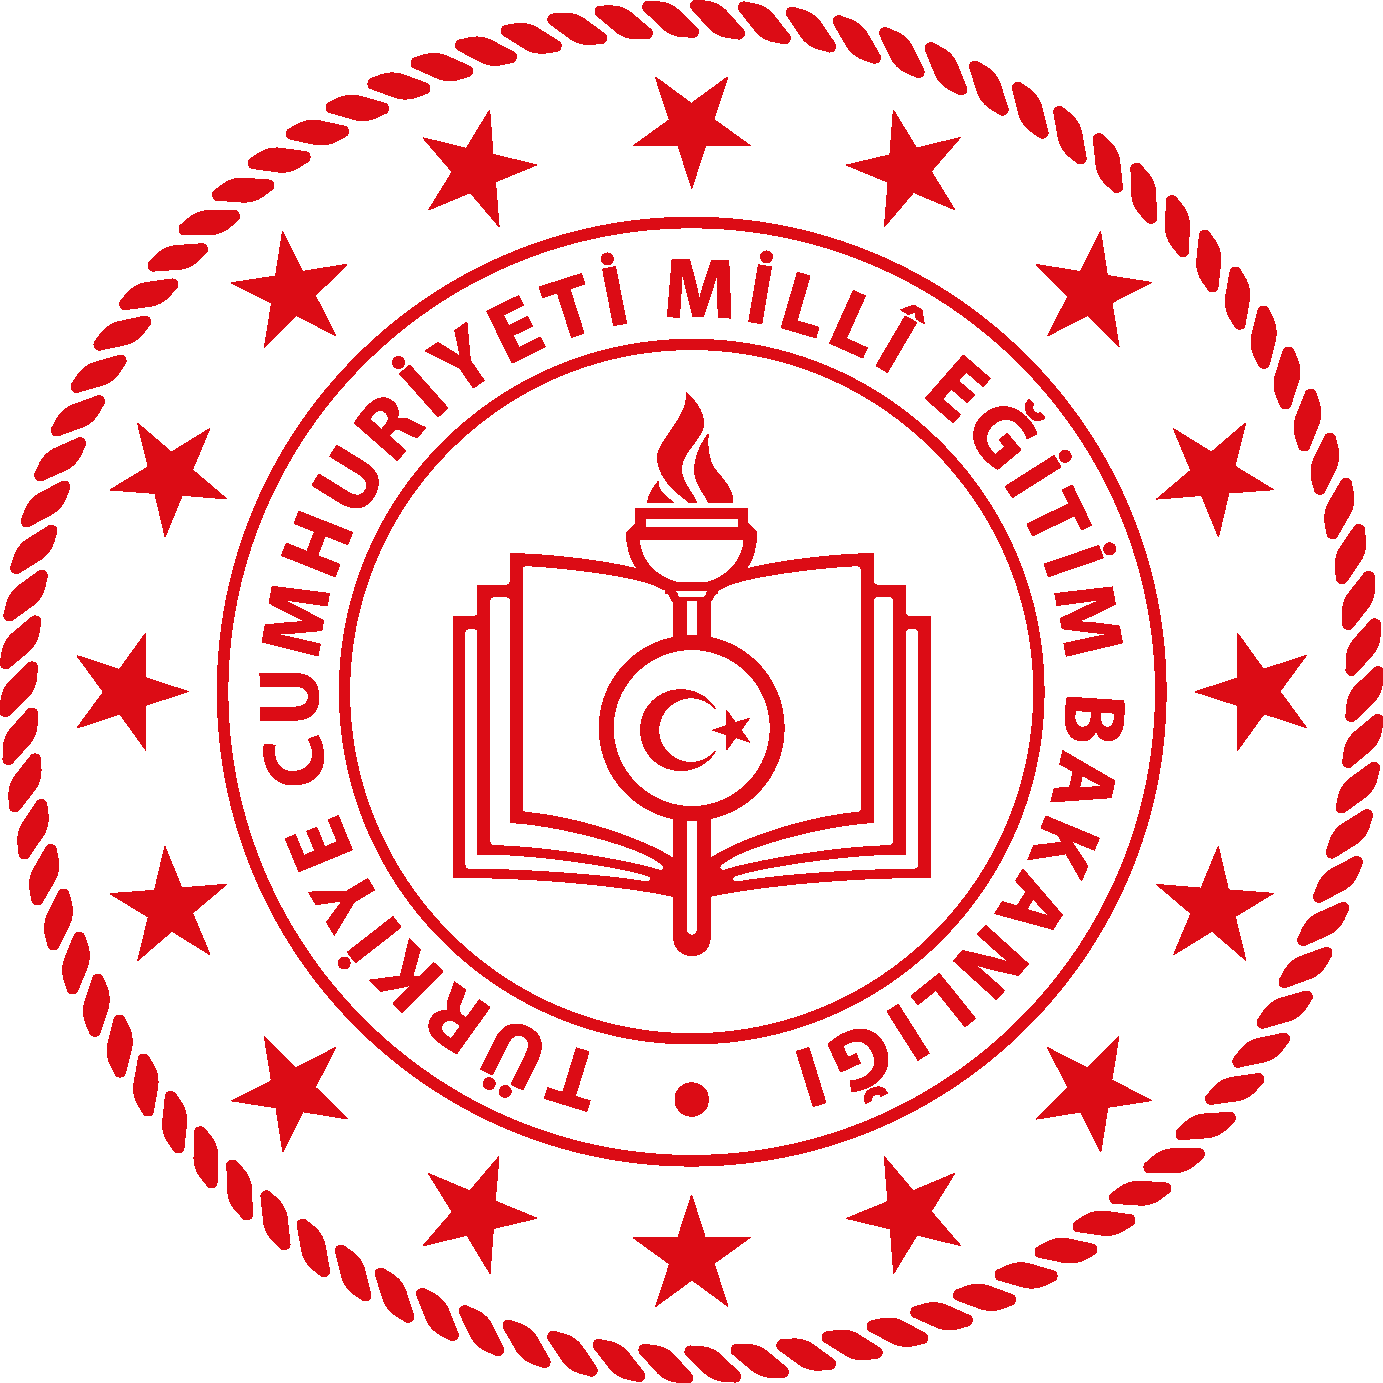 MEB Logo ve Amblem (Milli Eğitim Bakanlığı) meb.gov.tr image.